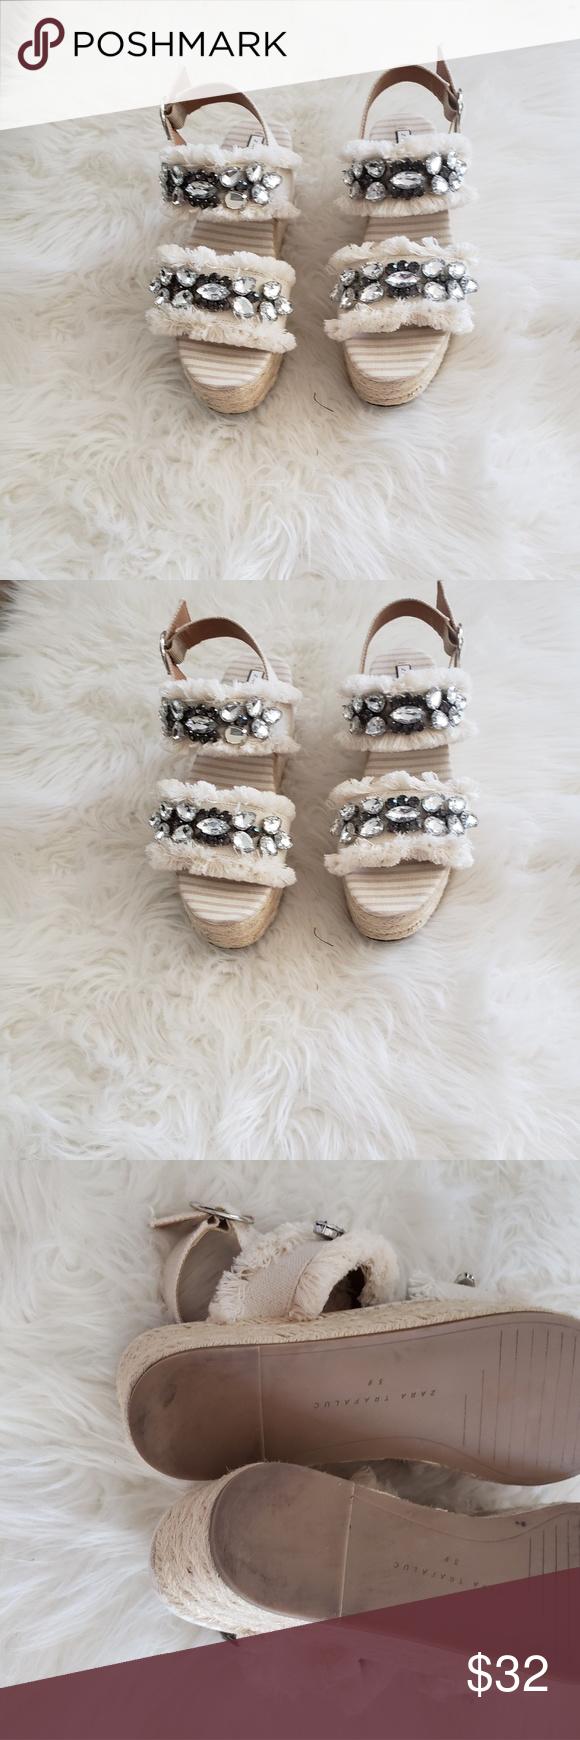 ZARA PLATFORM SANDAL   Platform sandals